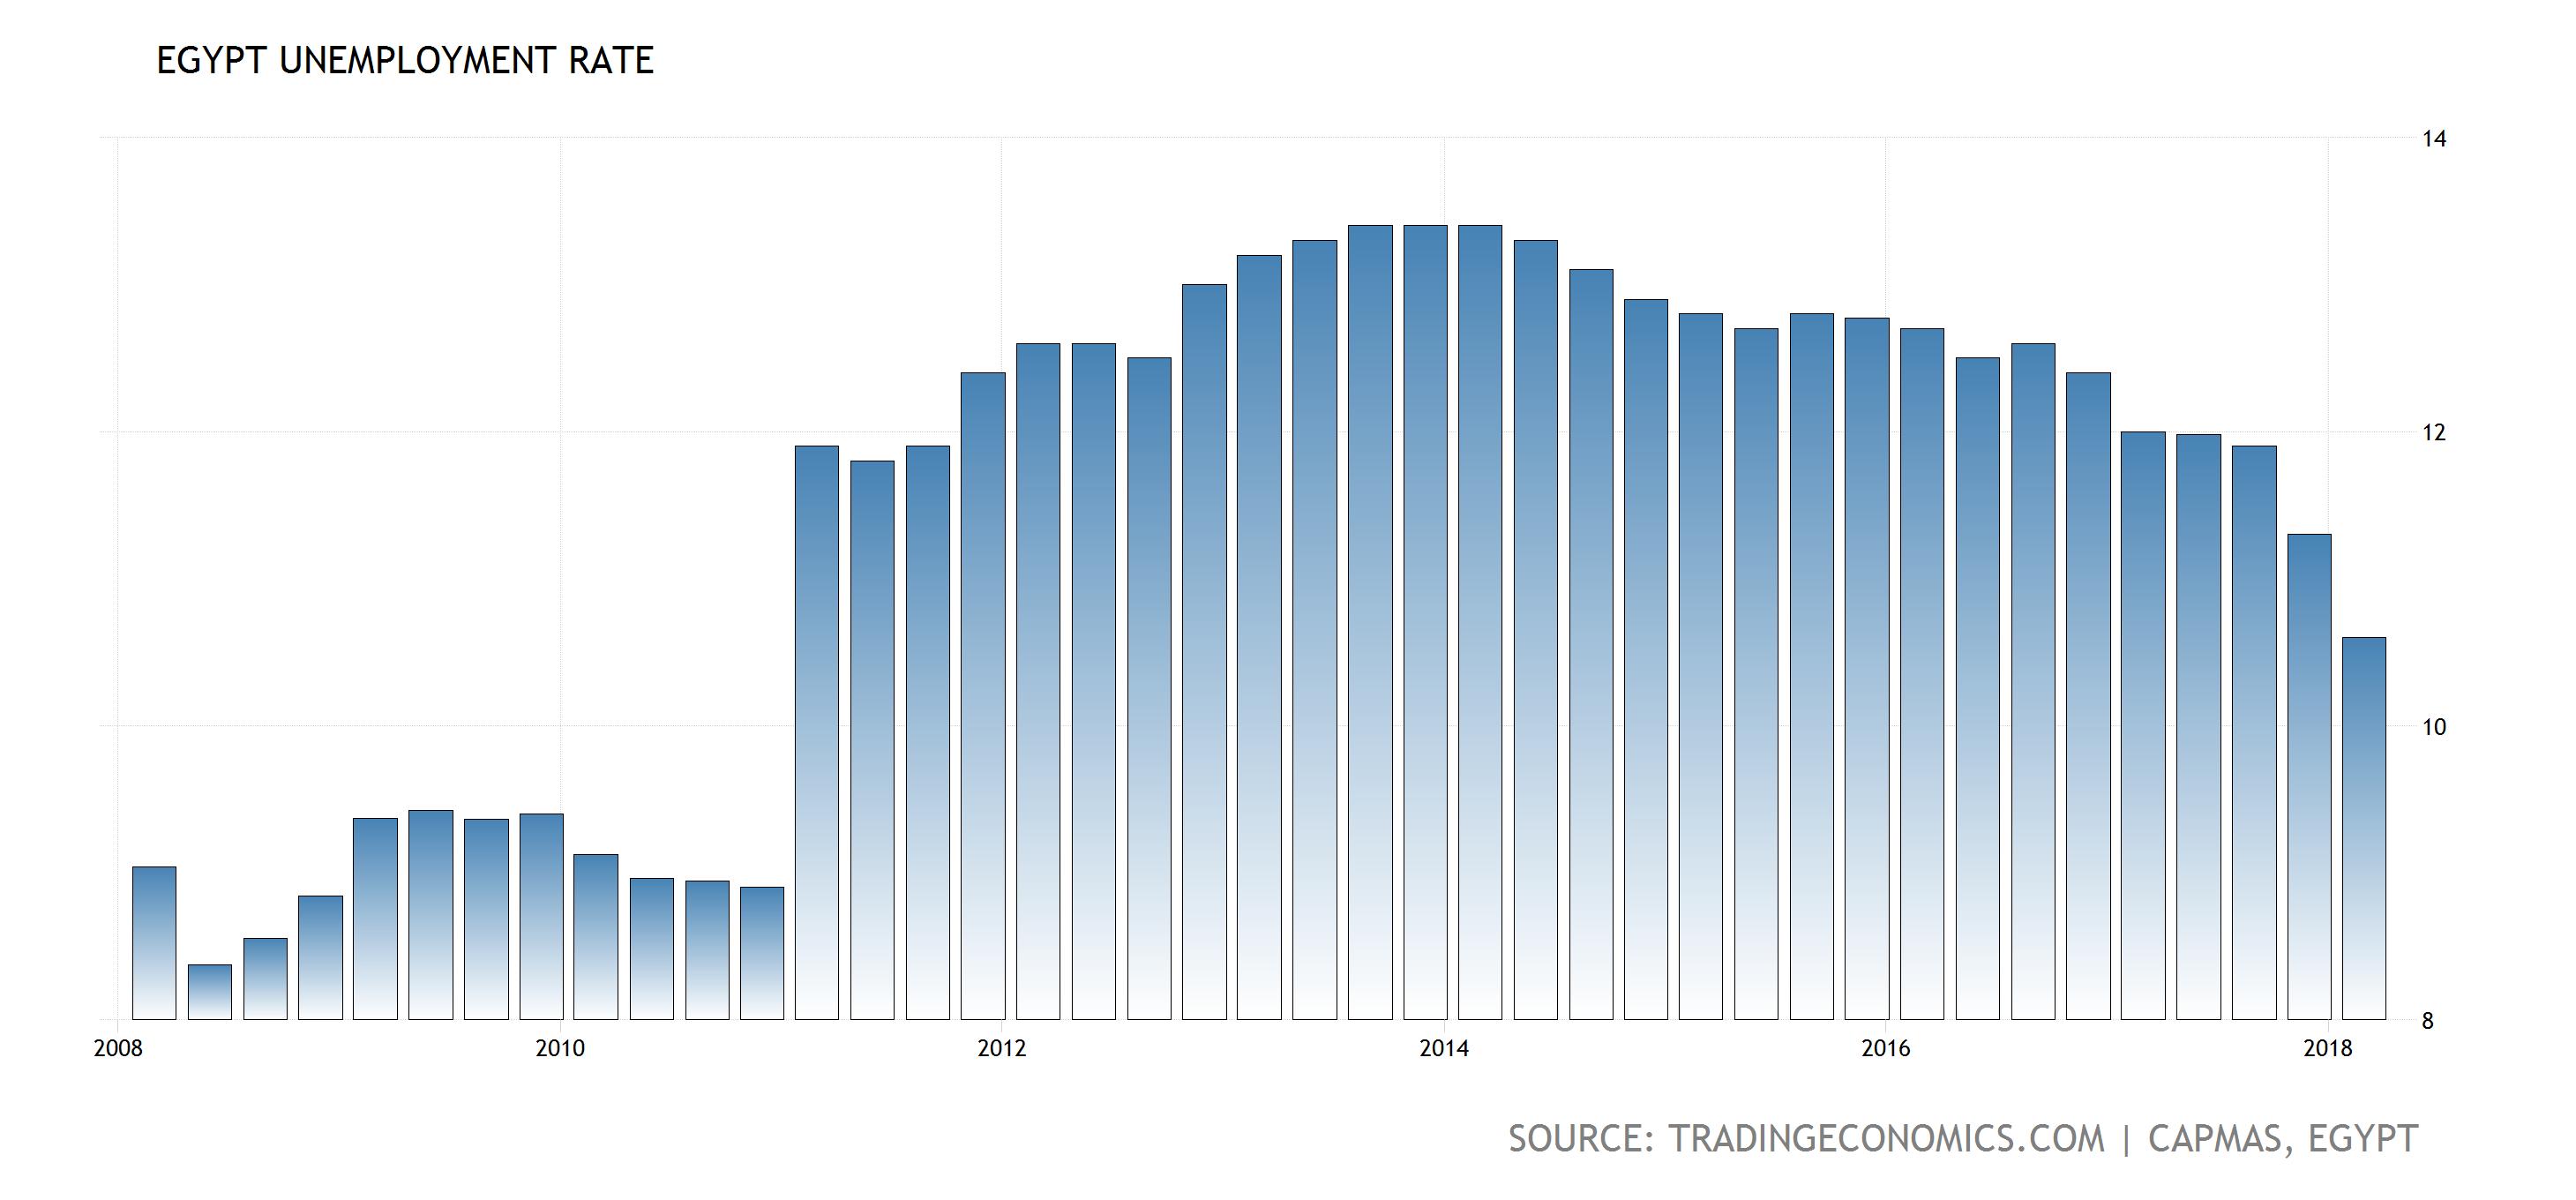 egypt unemployment rate unemployment rate data charts percents statistics bar chart  [ 2920 x 1360 Pixel ]